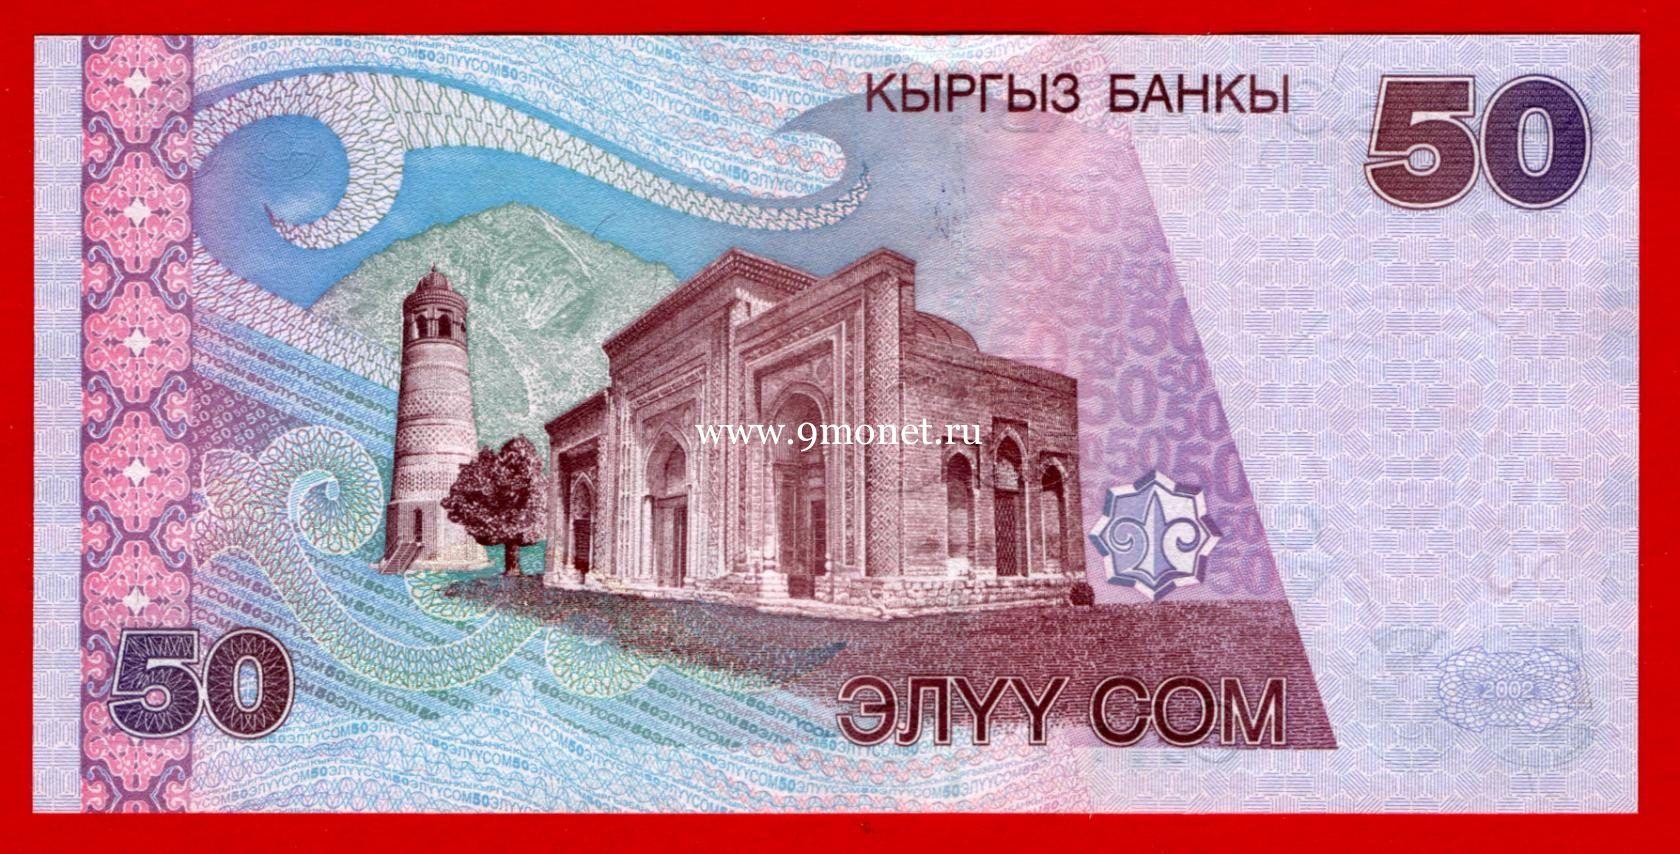 Банкнота Киргизии 50 сом 2002 года.